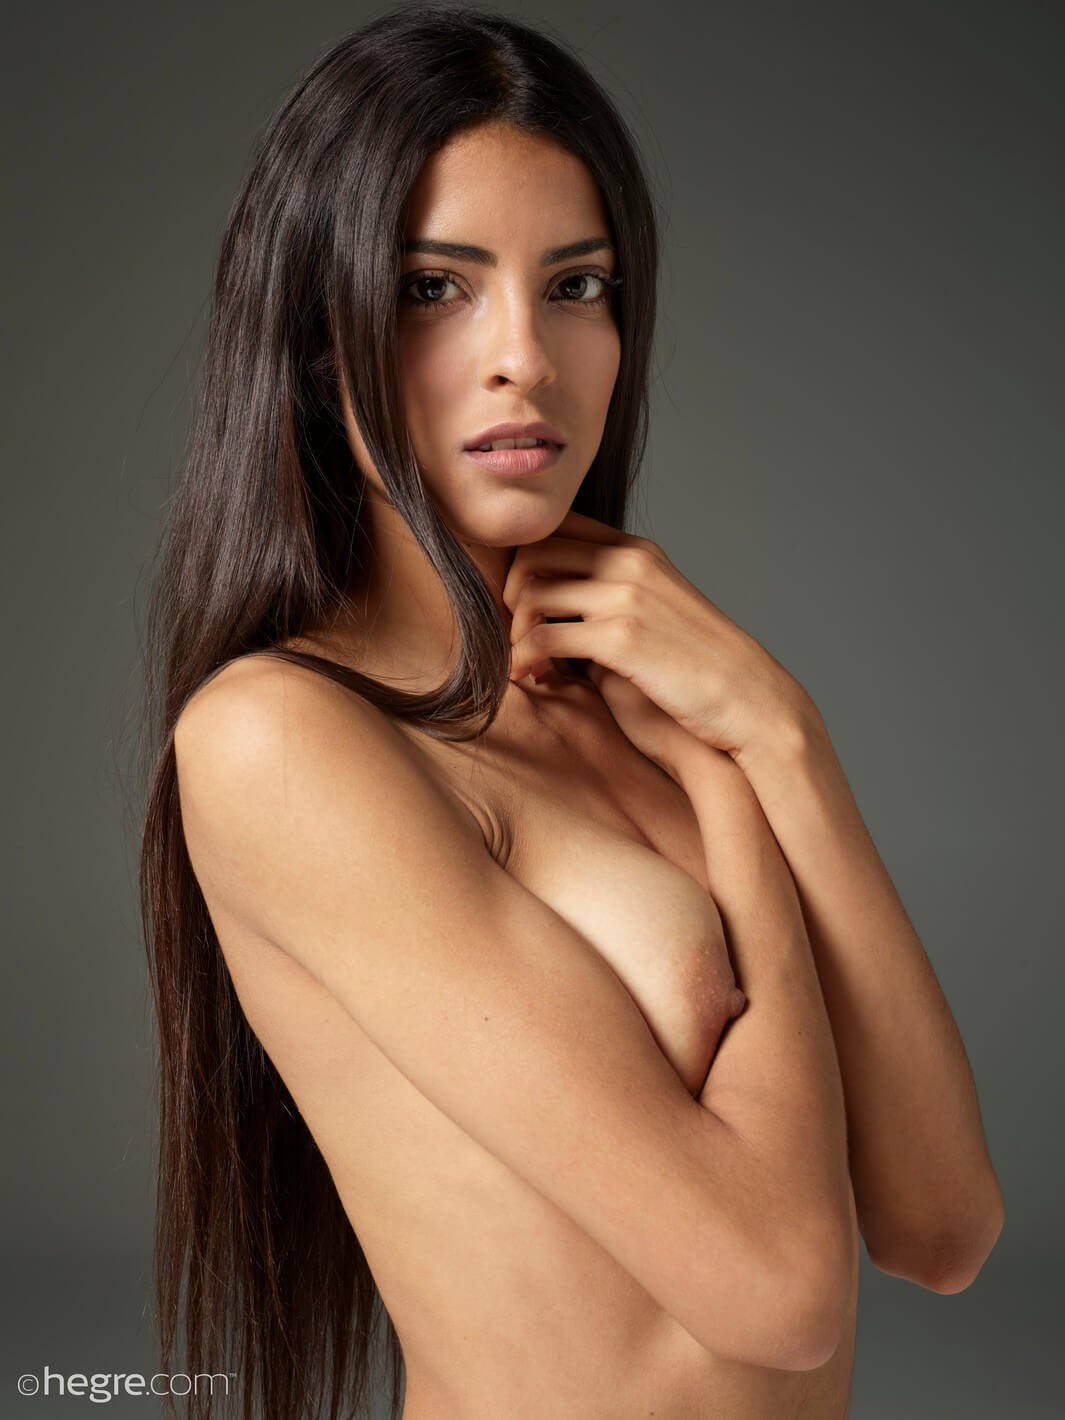 Hegre models nude Hegre Nude Shots Of New Model Clau Introduction 9 Photos Pandesia World